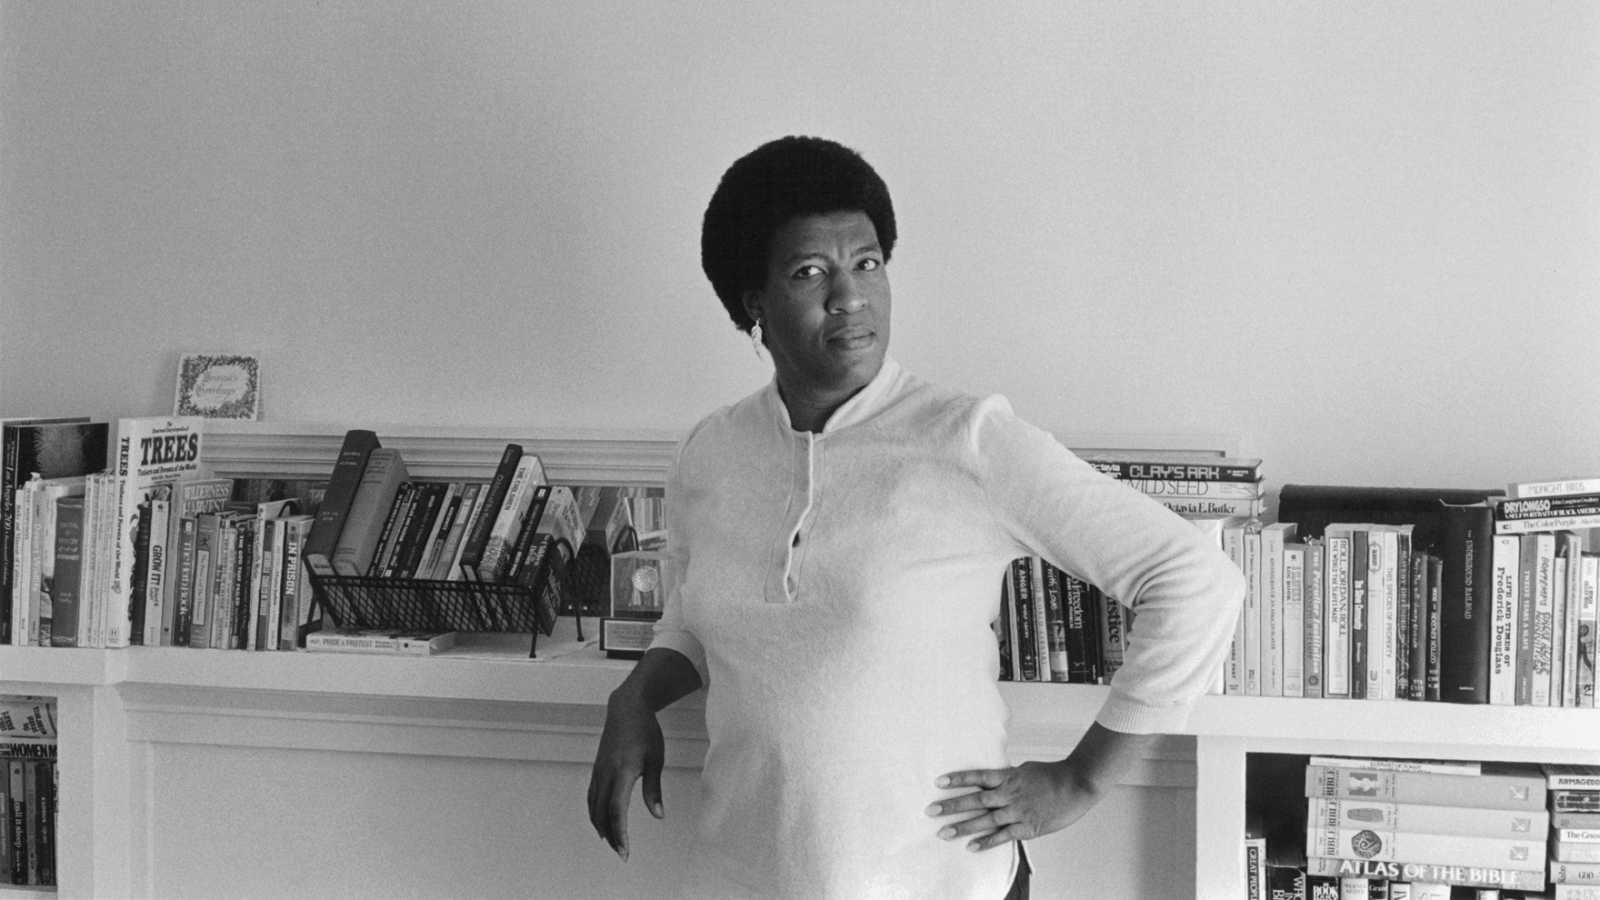 Si No Puedo Bailar... - El universo de Octavia E. Butler - 29/06/20 - escuchar ahora